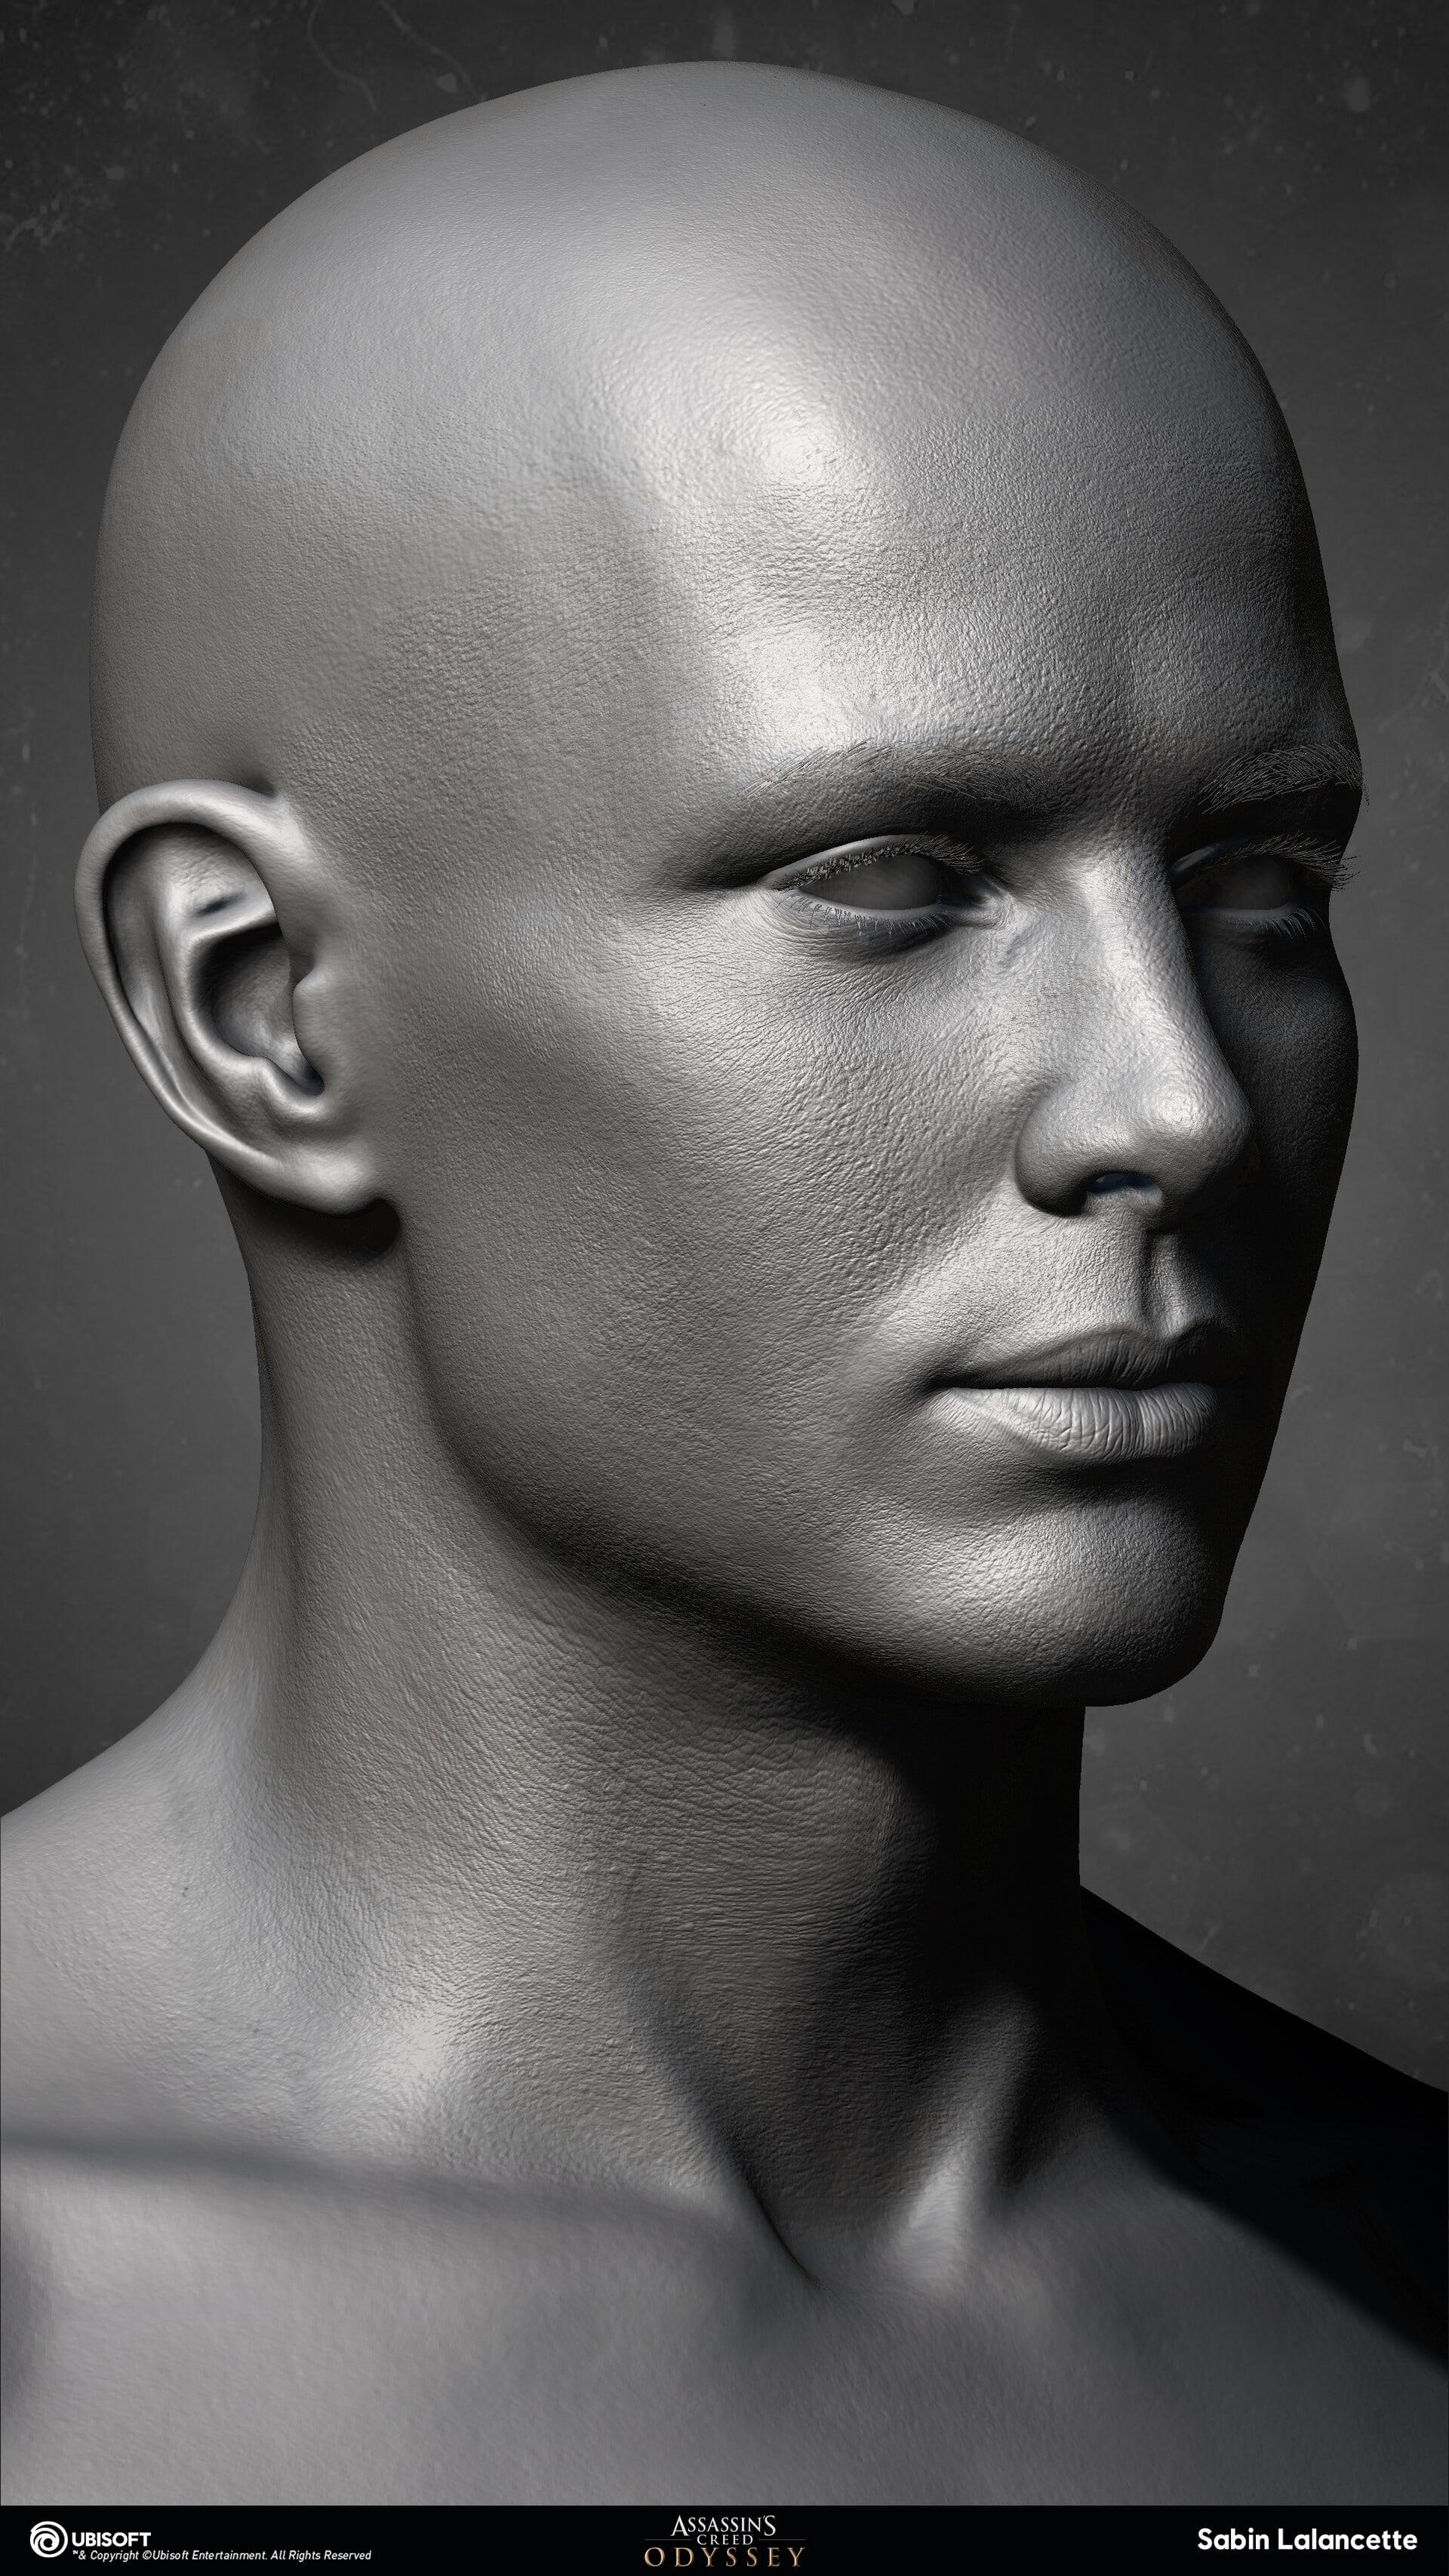 sabin-lalancette-artblast-fullsizezb-head3q-hermes-slalancette